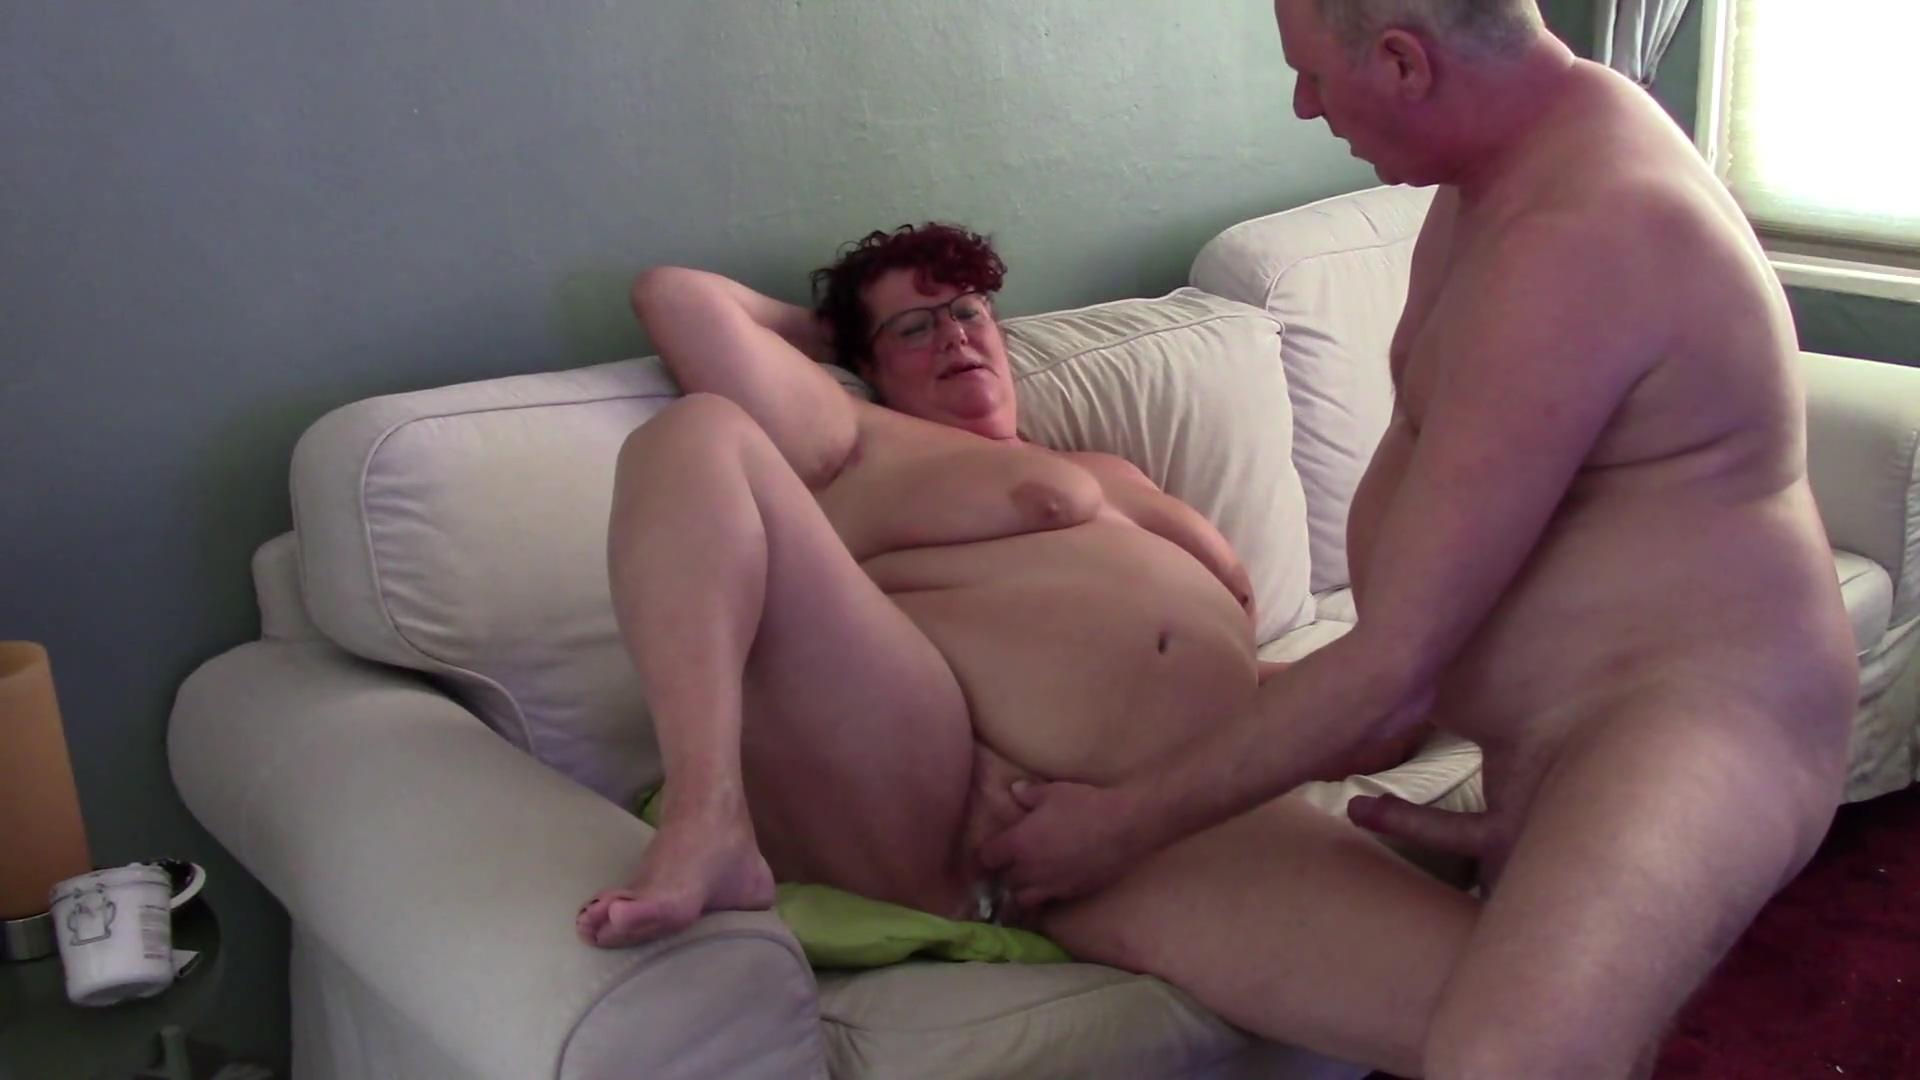 Video 1563067704: bbw deep throats cock, mature bbw big tits, red head bbw, bad bbw, bbw hd, brunette bbw